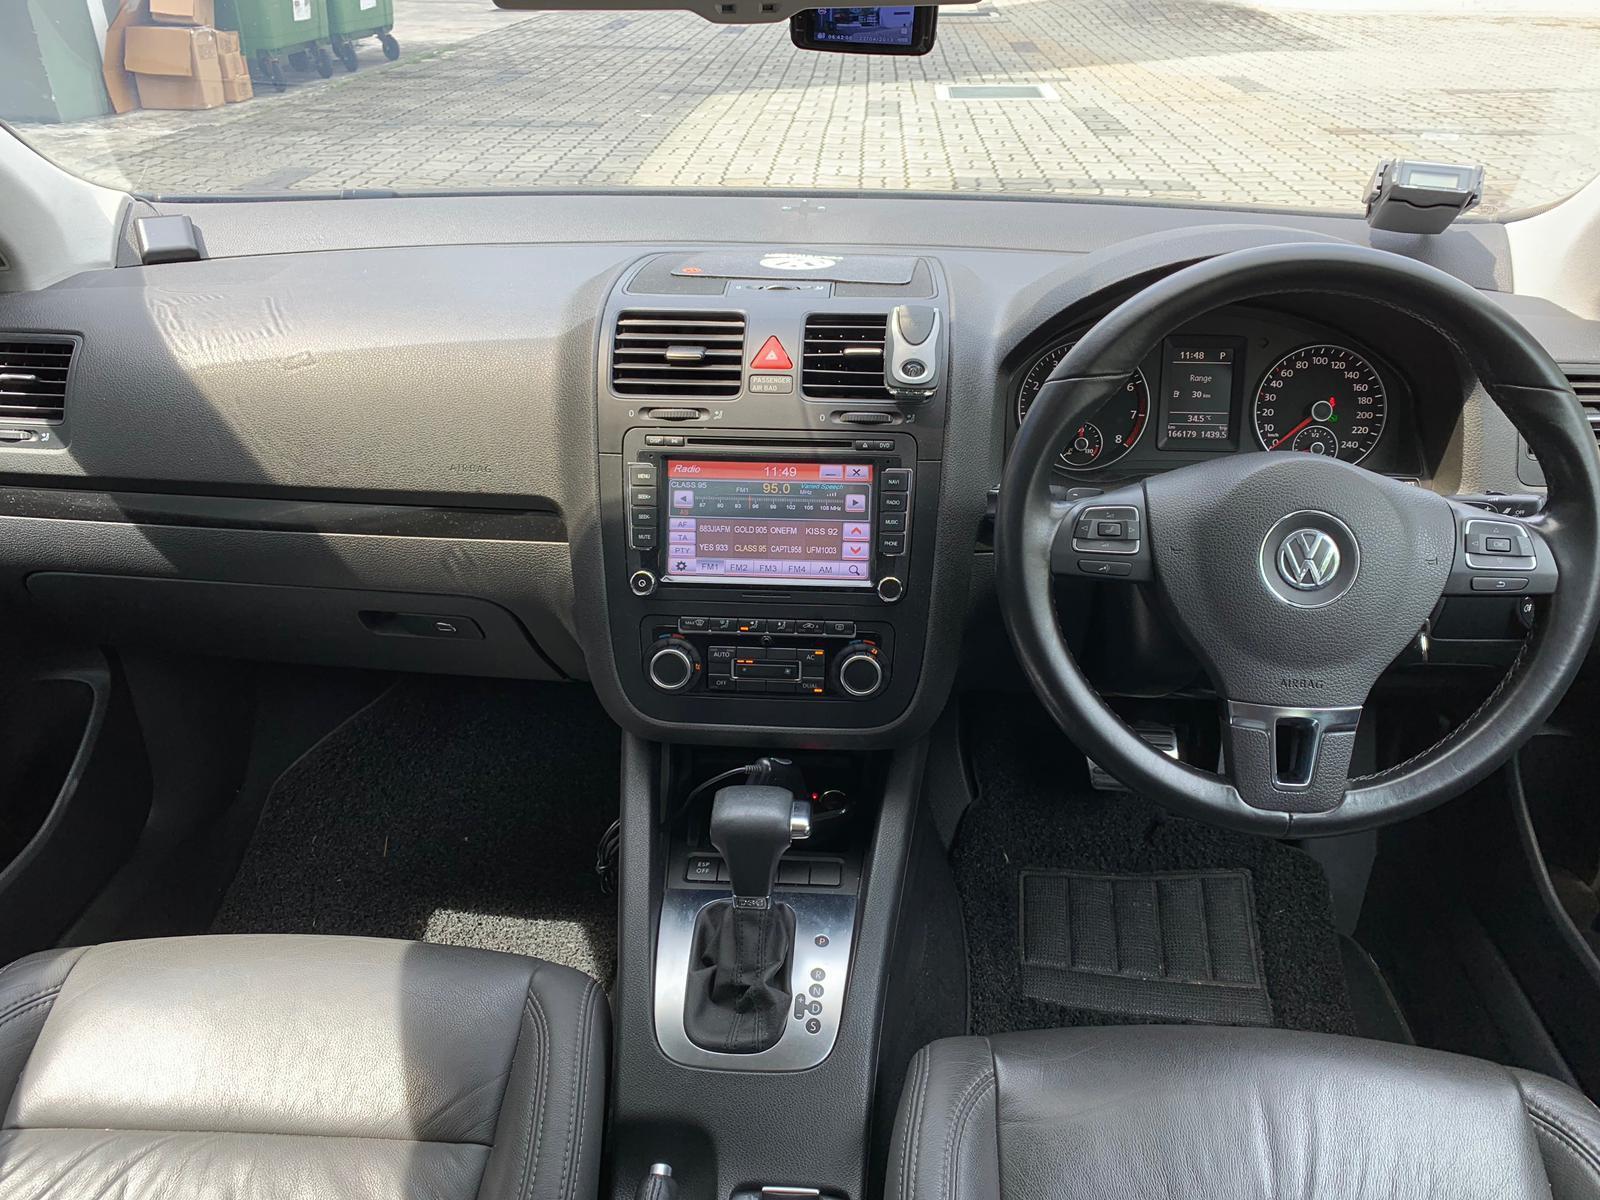 Volkswagen Jetta 1.4 TSI Nice Conti Car for Rental